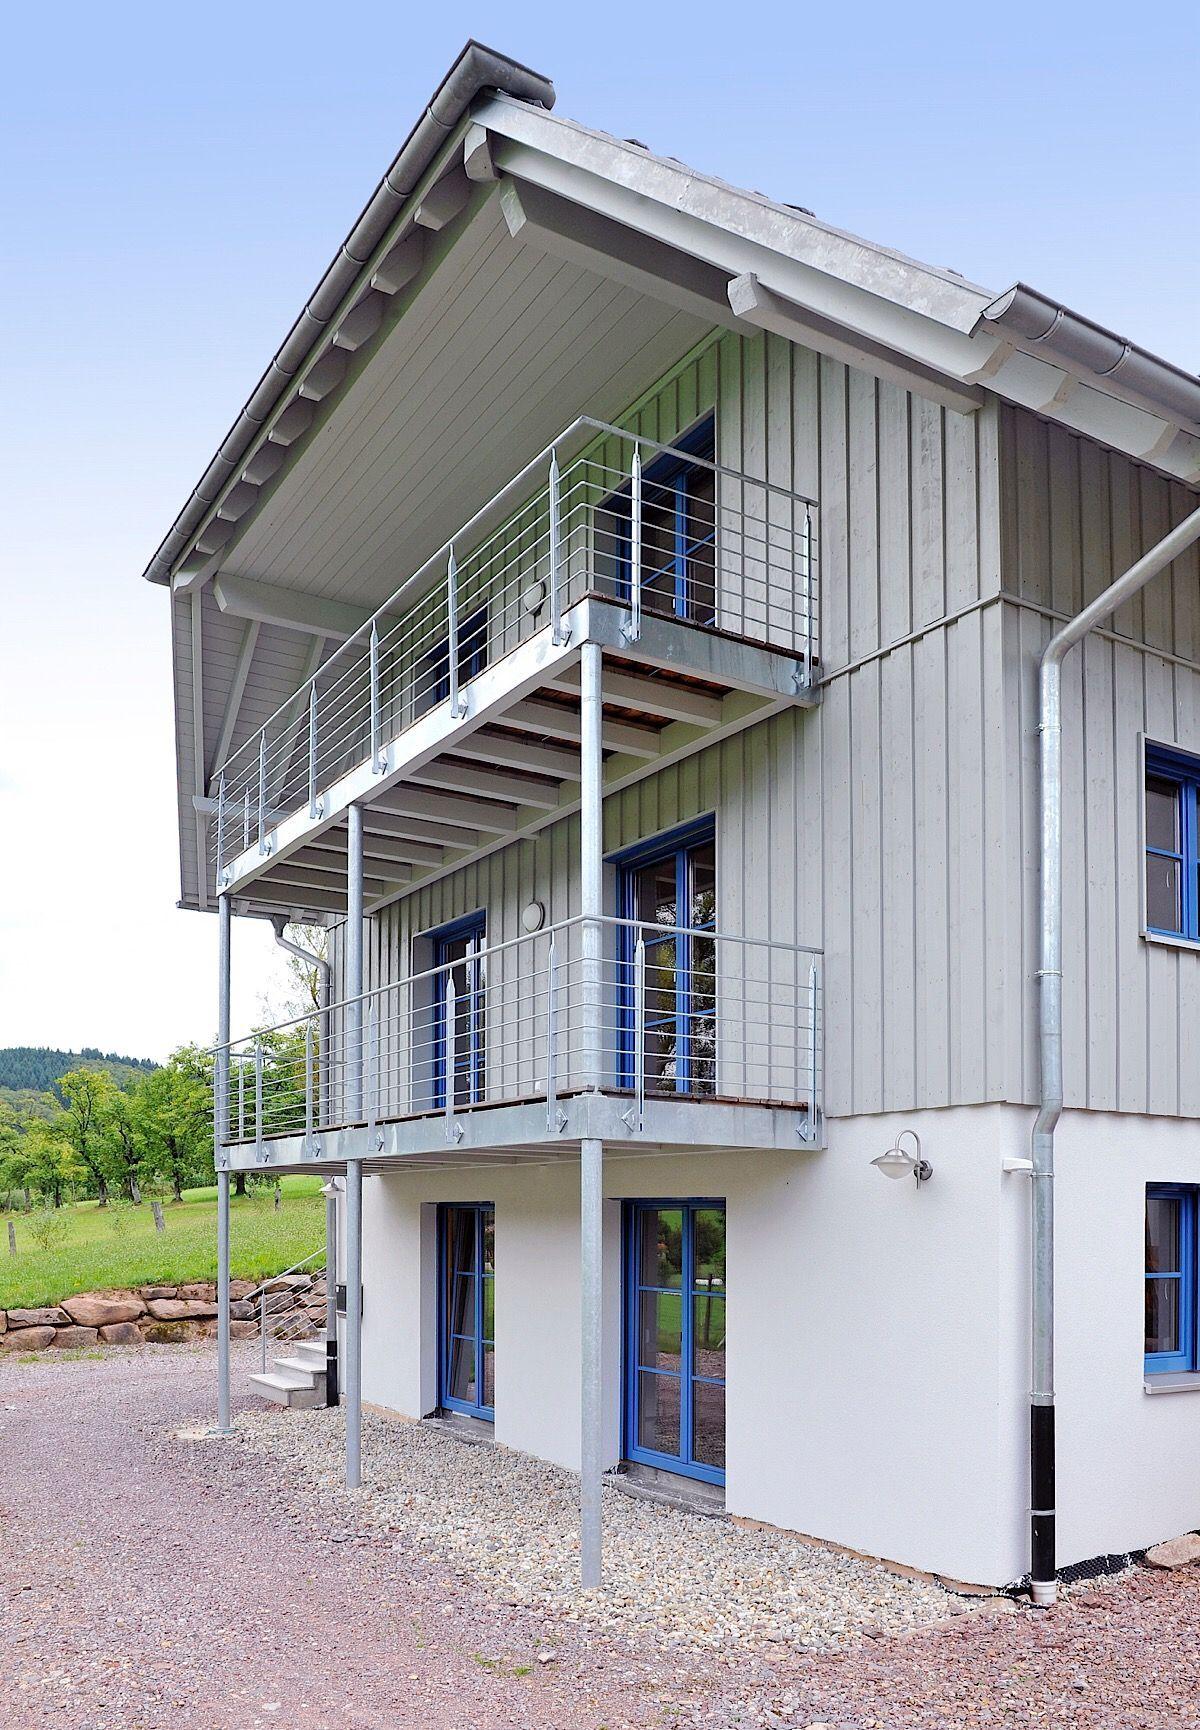 Photo of Modernes Einfamilienhaus Natur 156 in Hanglage – Frammelsberger H